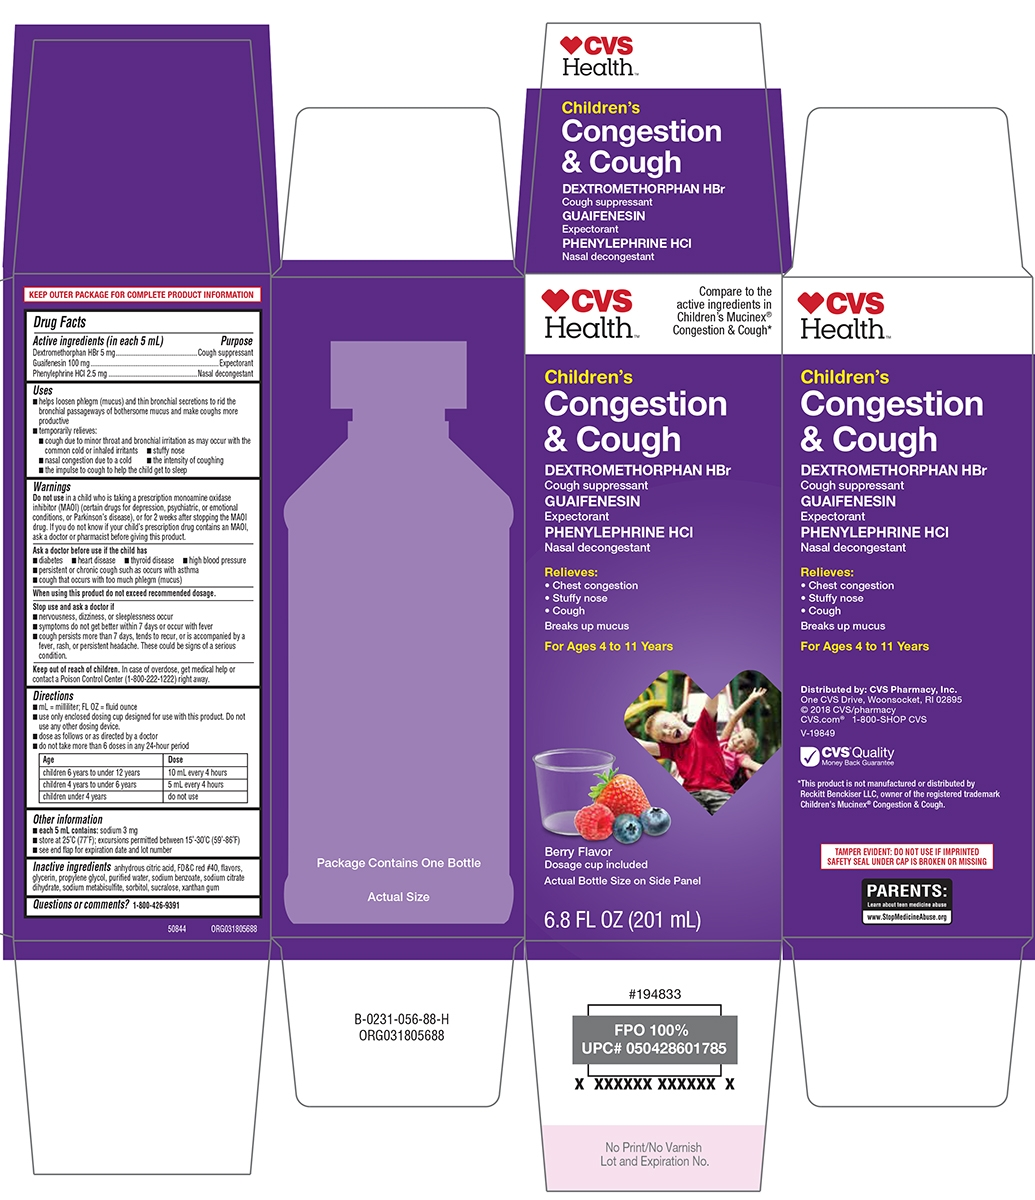 CVS Health 44-056